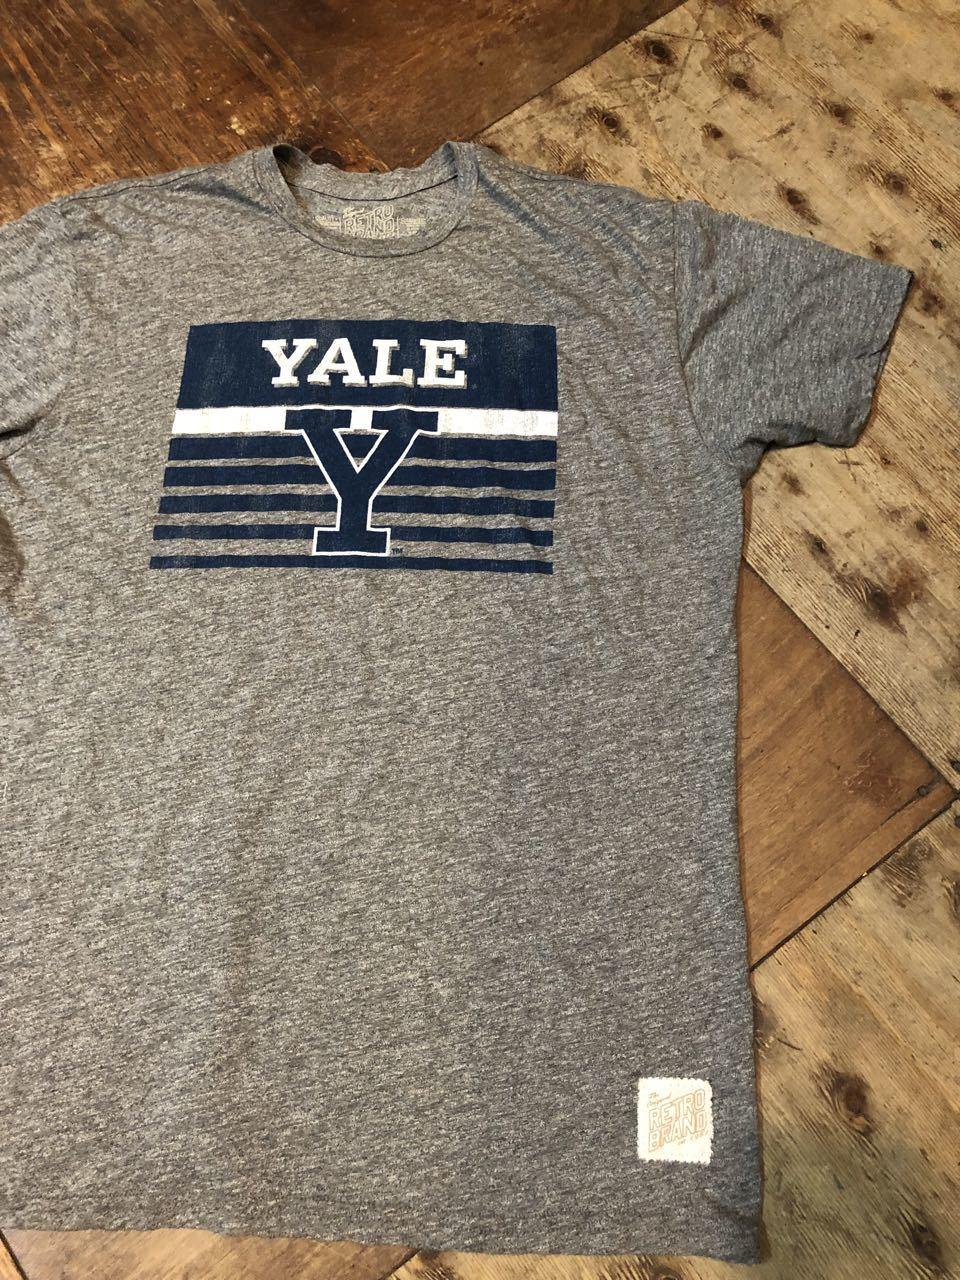 6月10日(月)入荷! MADE IN U.S.A YALE大学 Tシャツ!_c0144020_14453505.jpg